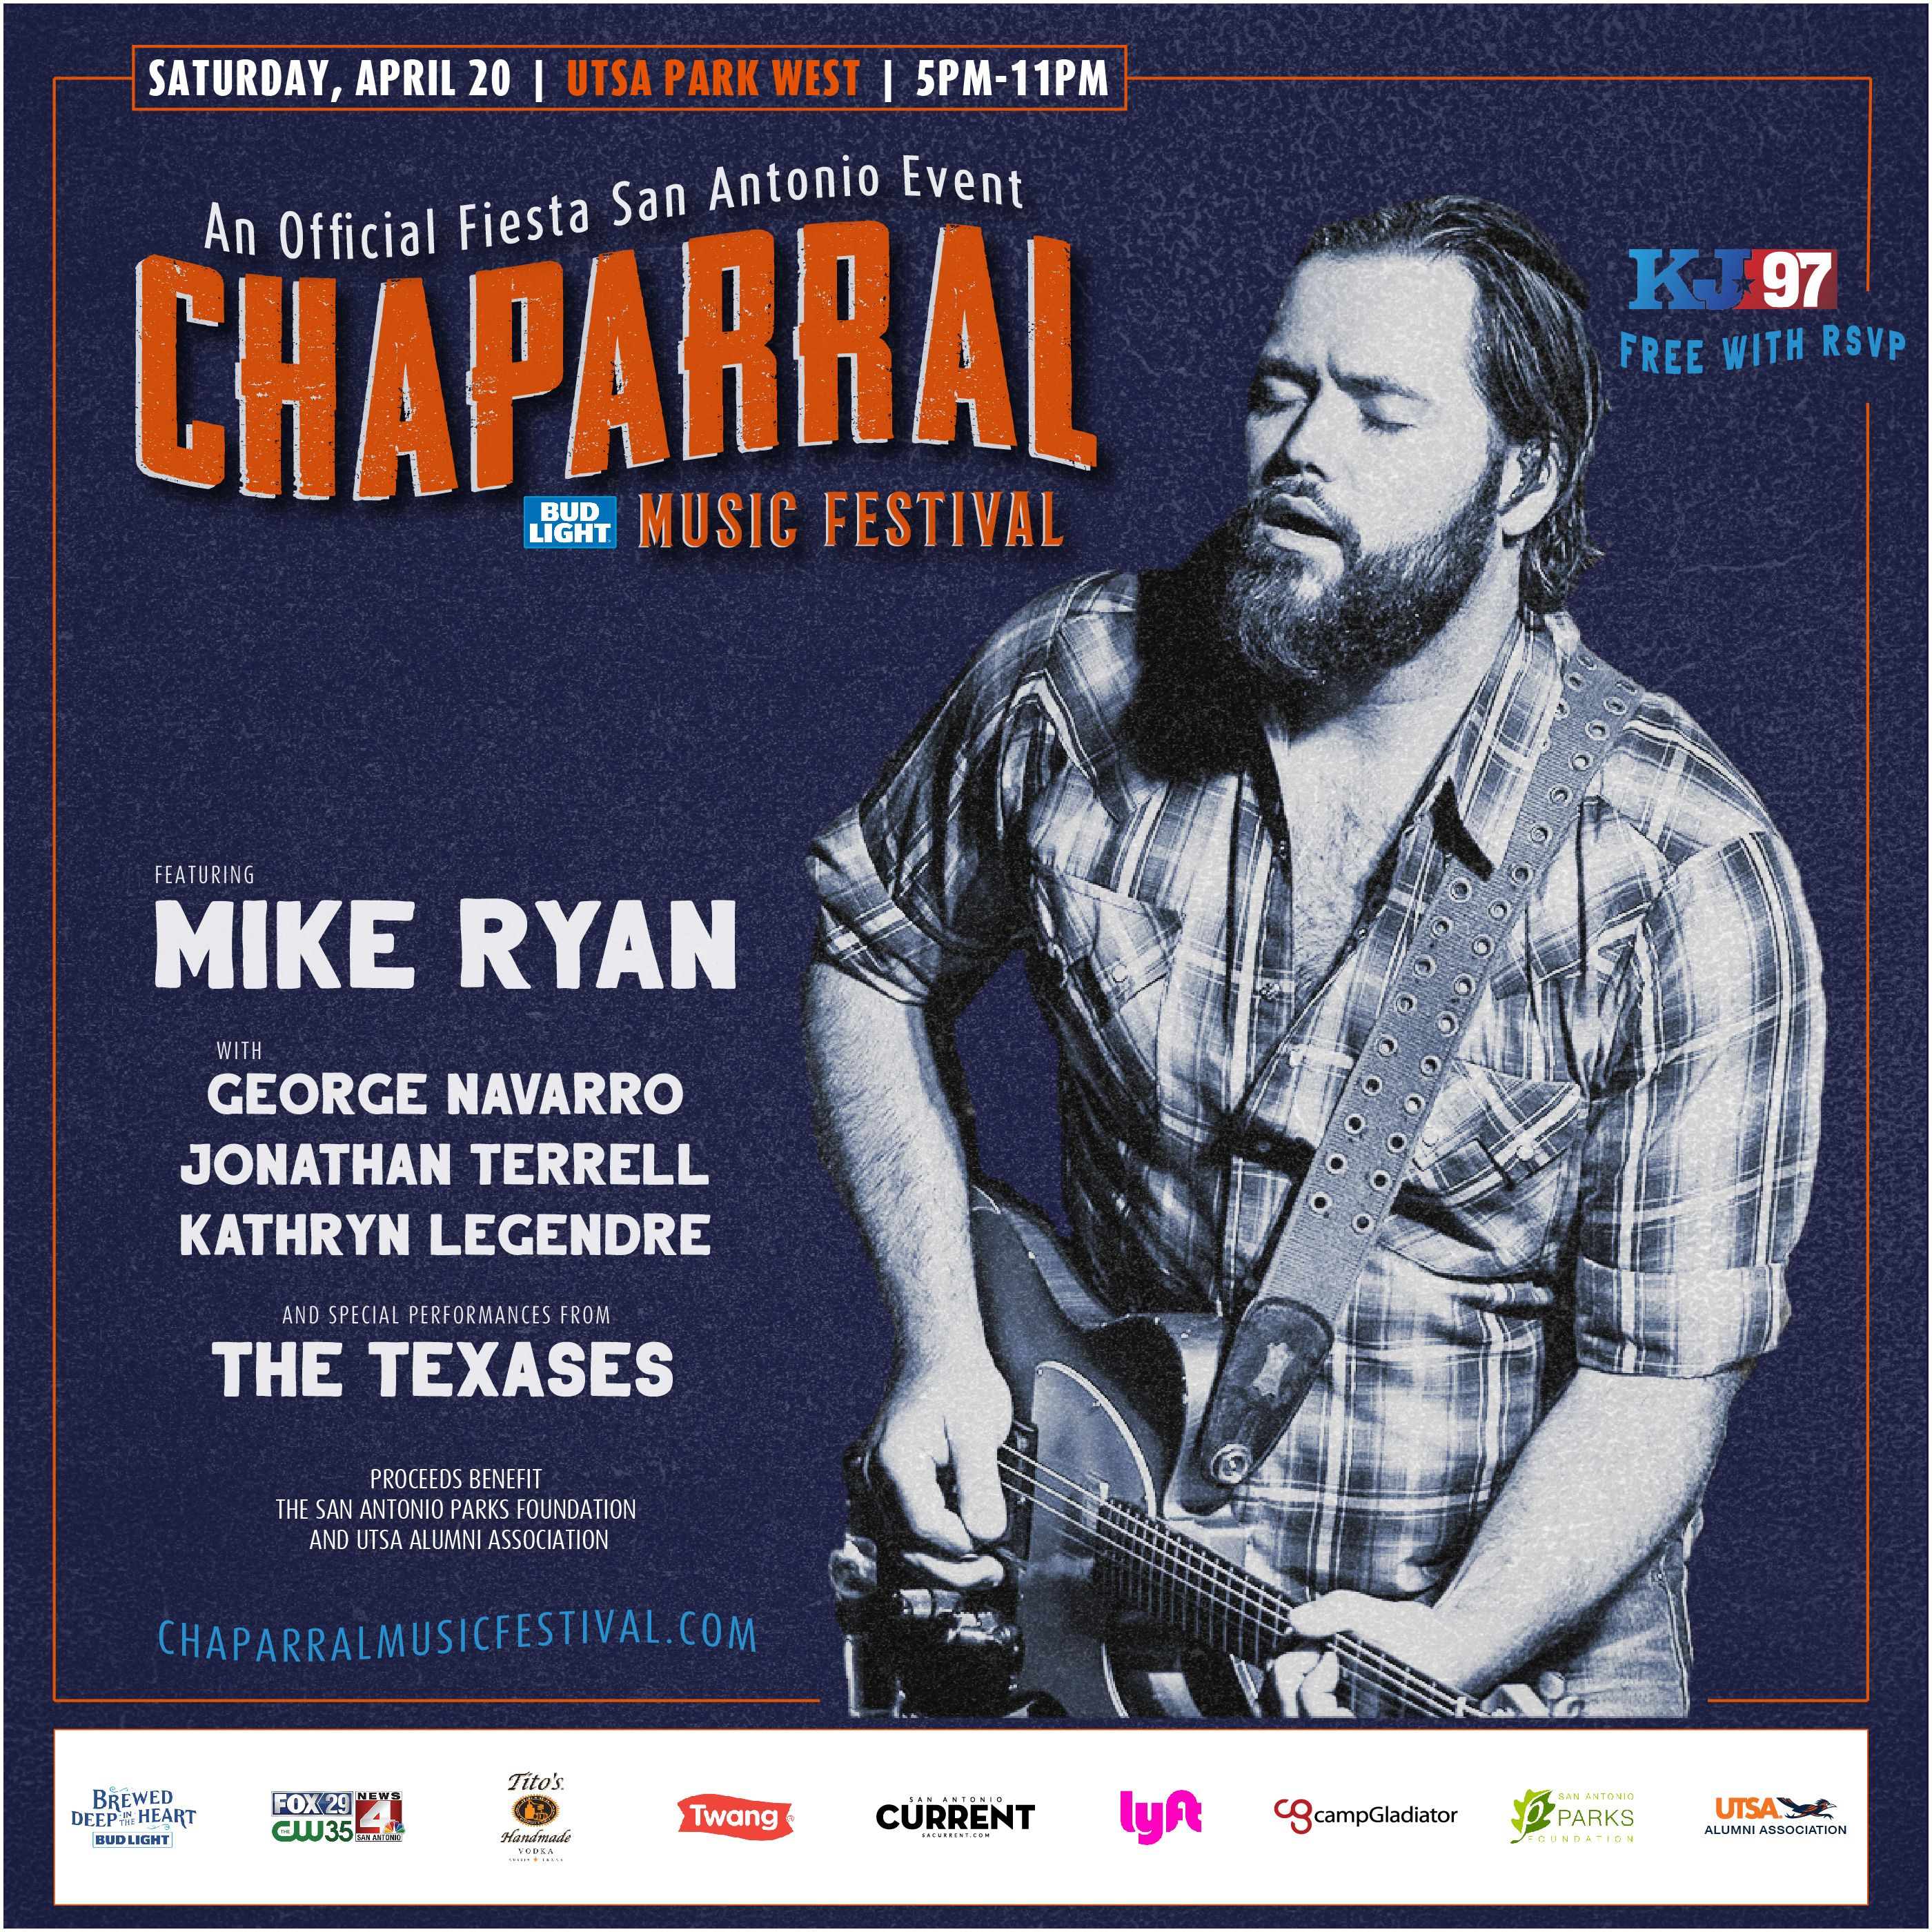 San Antonio Book Festival 2019 Chaparral Music Festival San Antonio Parks Foundation